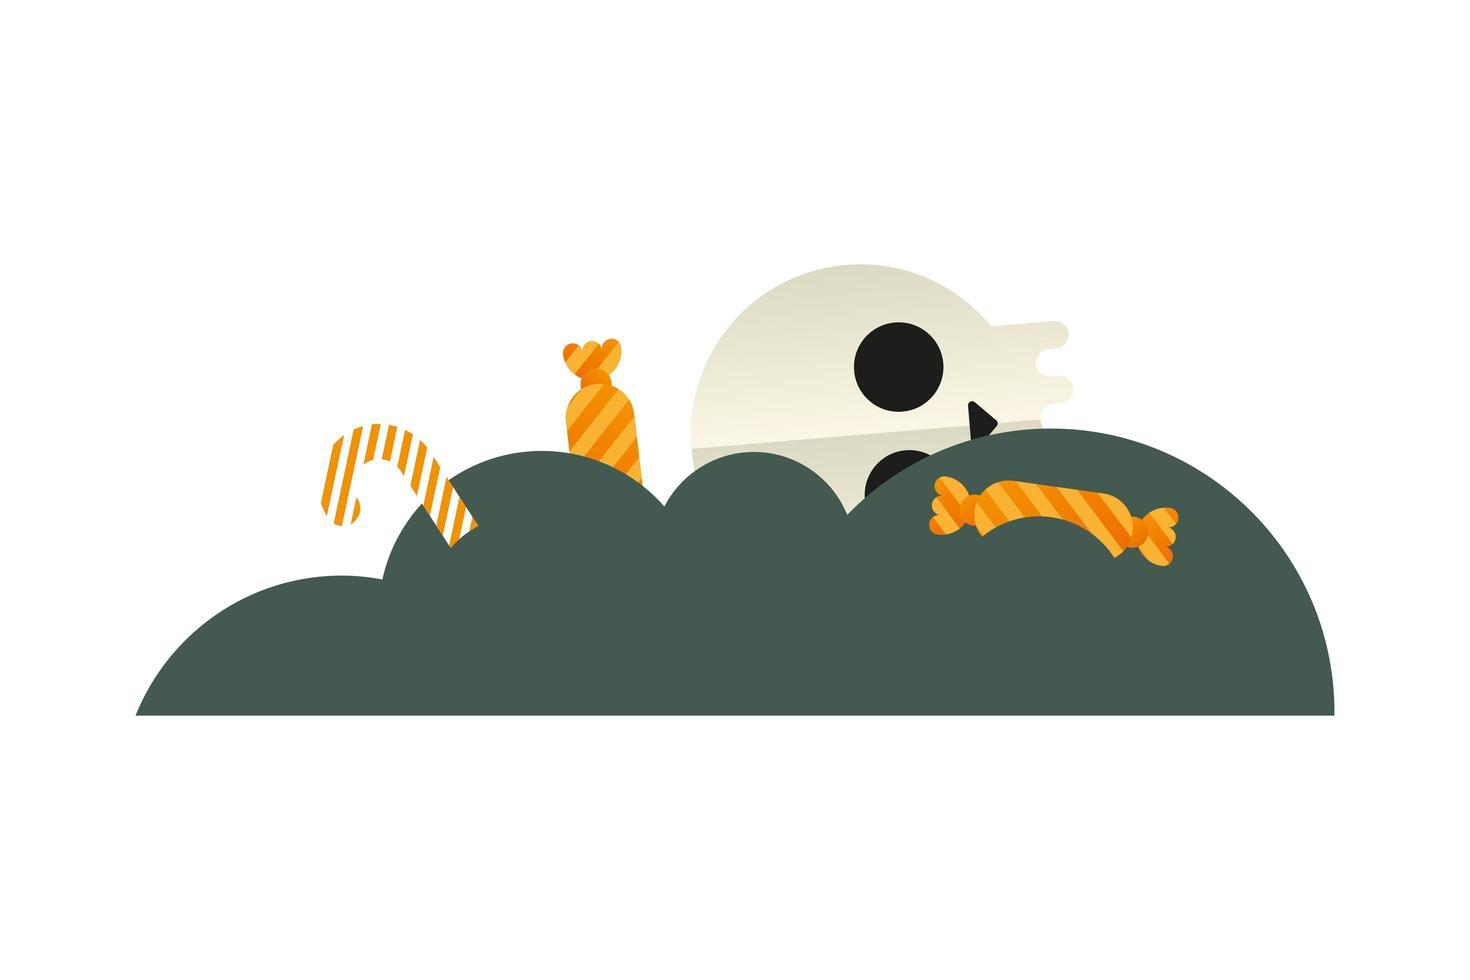 Calavera de halloween con diseño de vector de caramelos